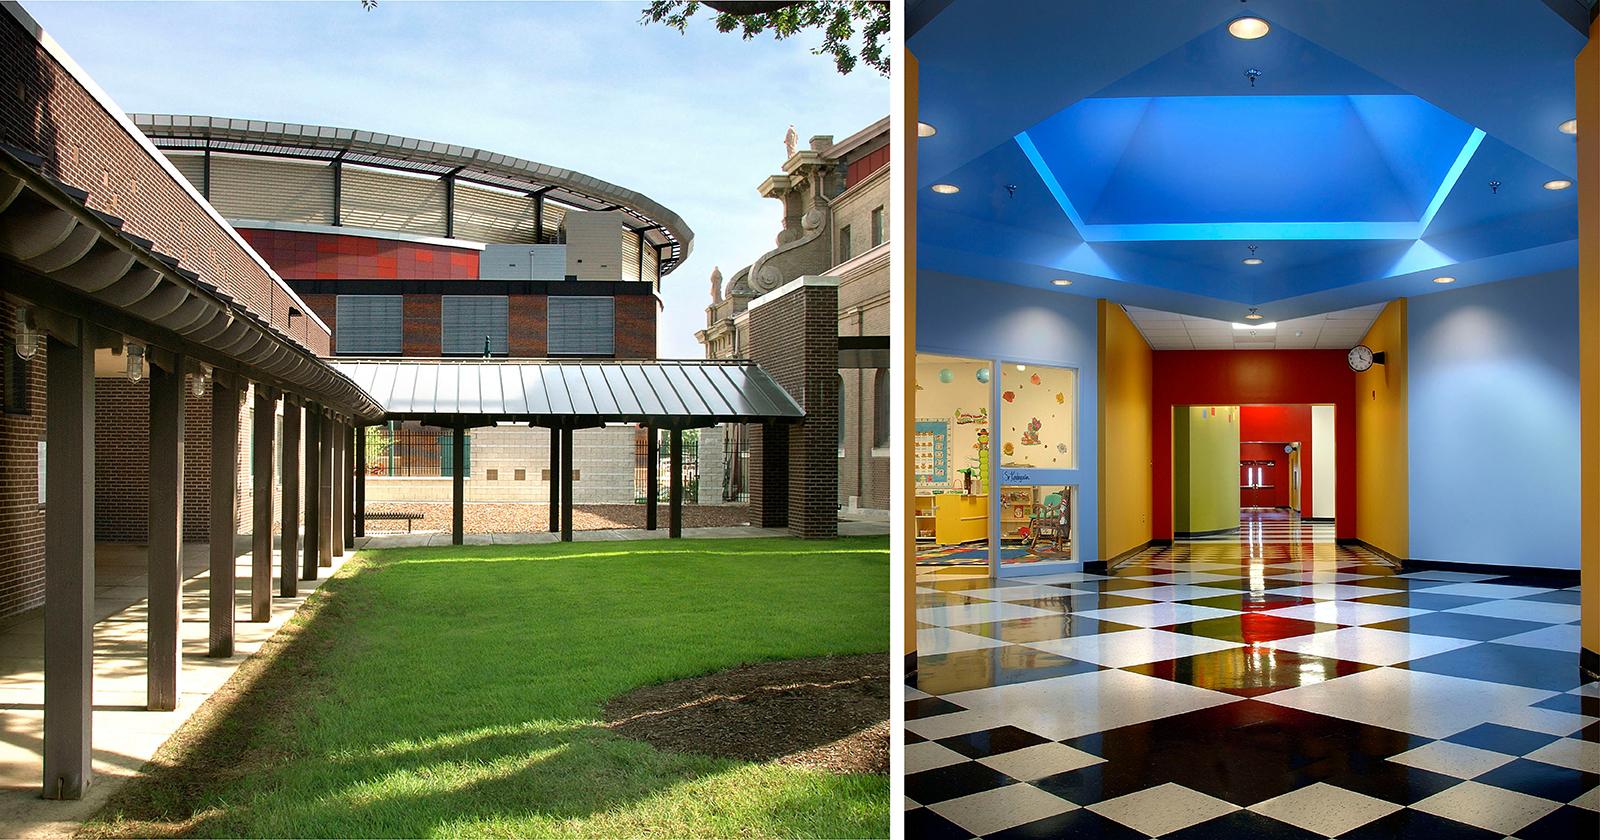 St. Patrick School and Literacy Center, Memphis, TN